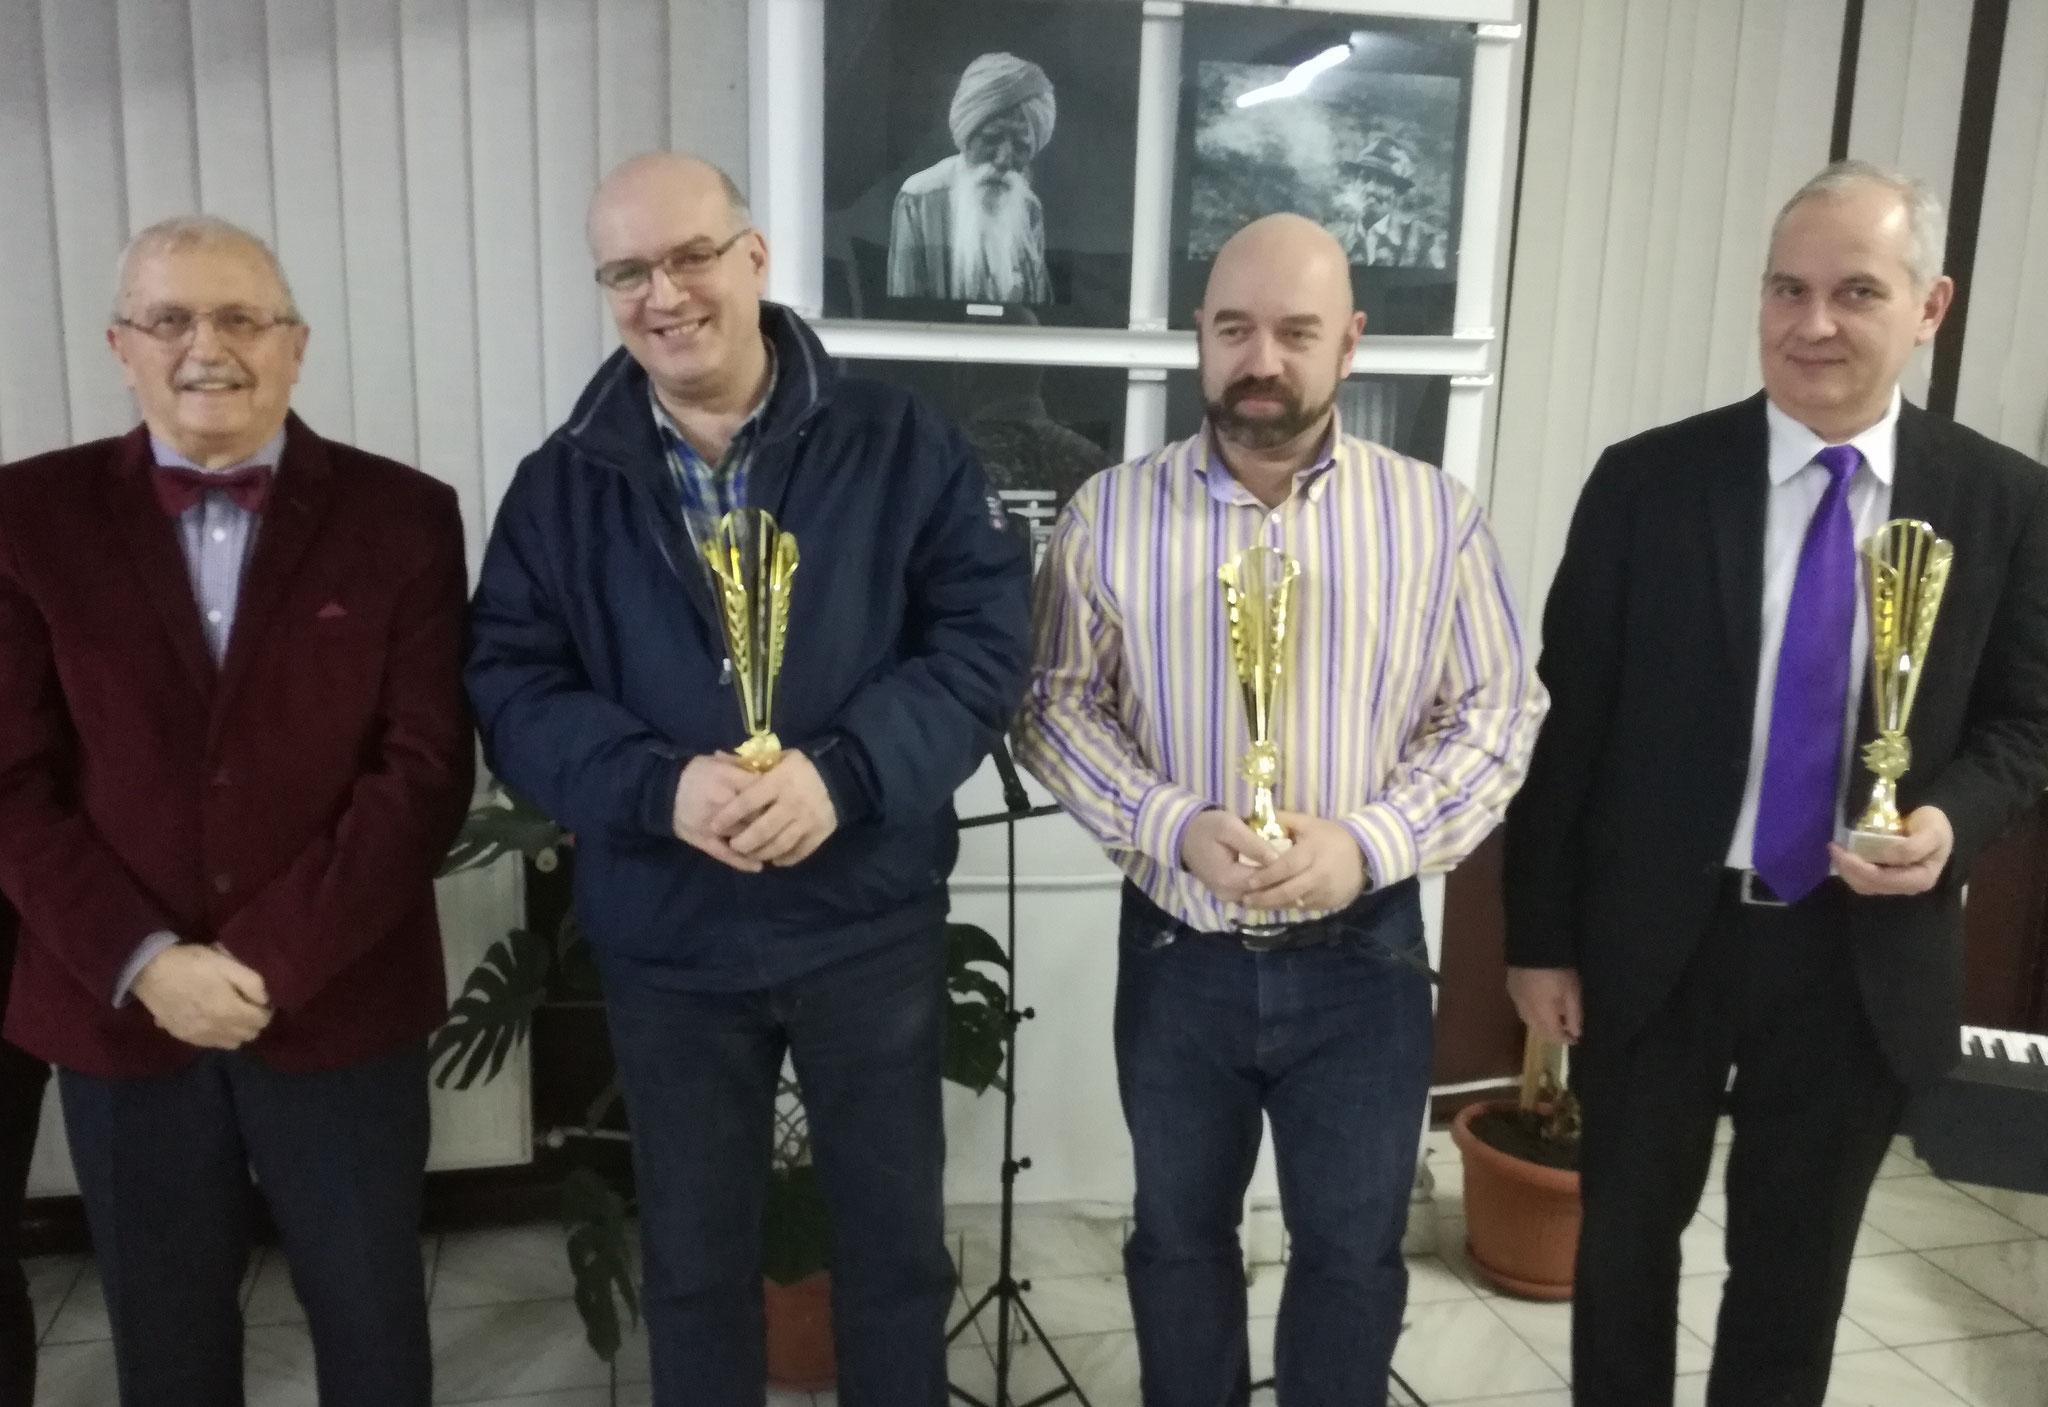 Foto: Zoltán Gardó